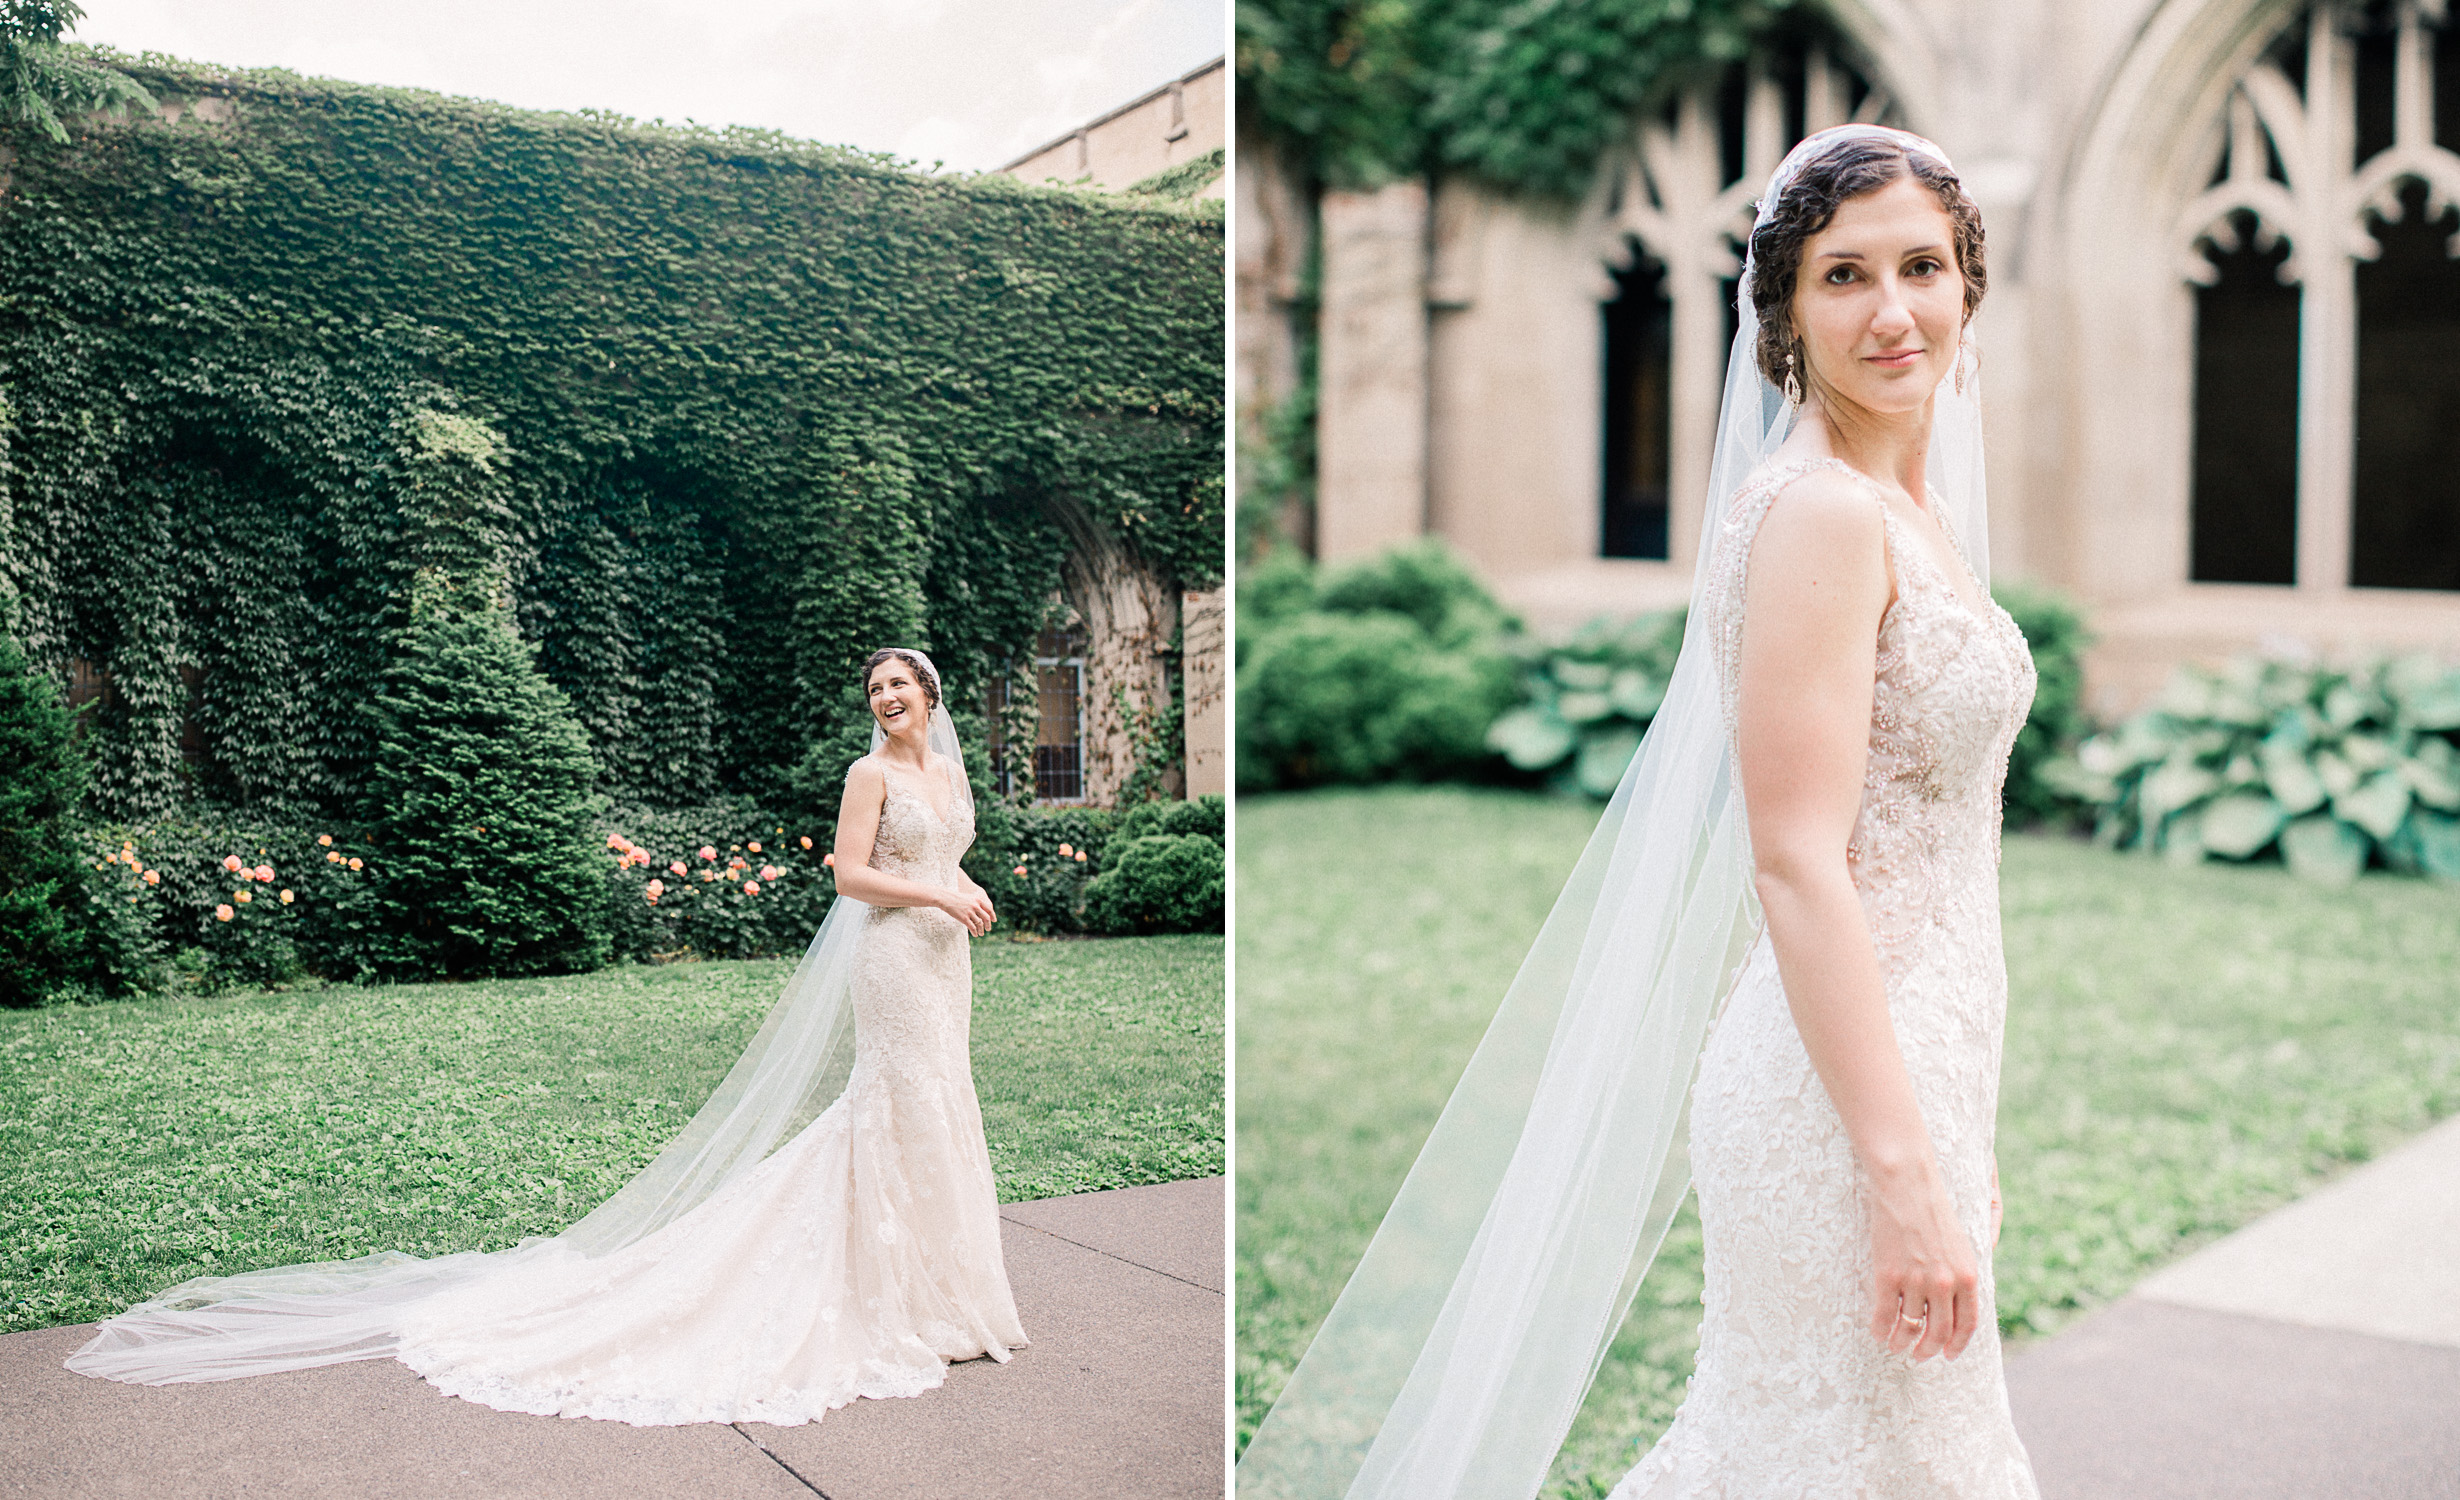 Dorothy_Louise_Photography_University_of_Chicago_Wedding14.jpg